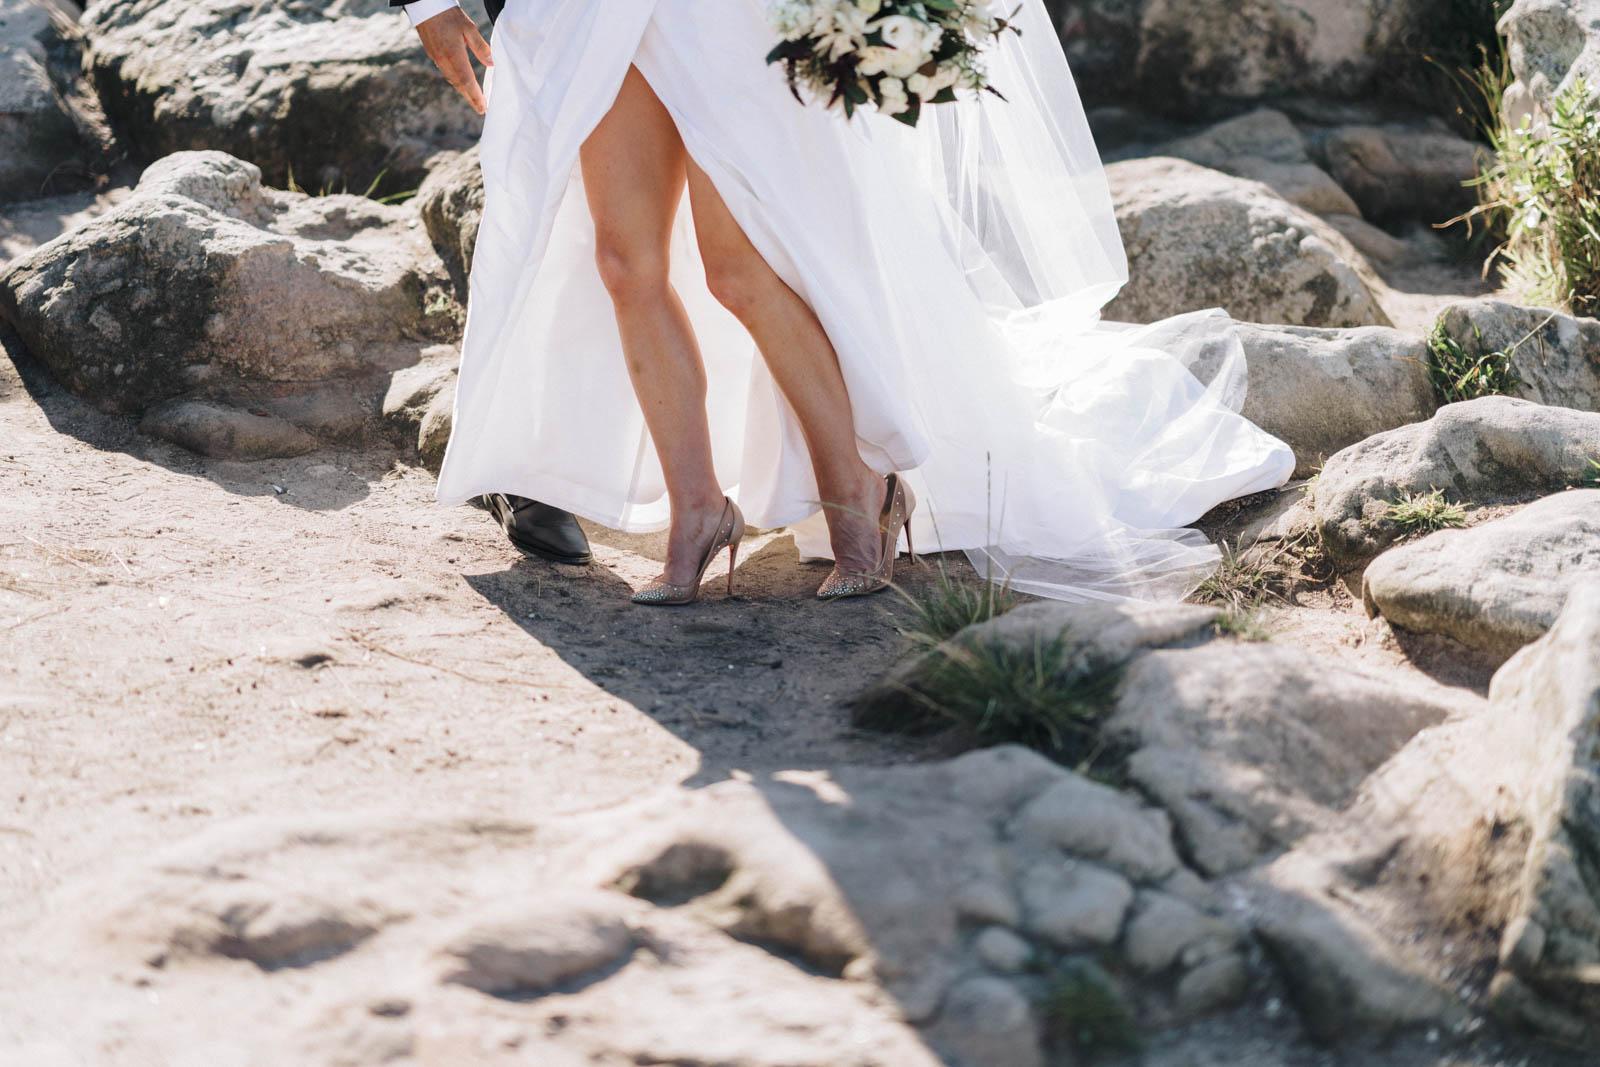 newfound-s-p-mt-maunganui-tauranga-wedding-photographer-1458-A9_04906